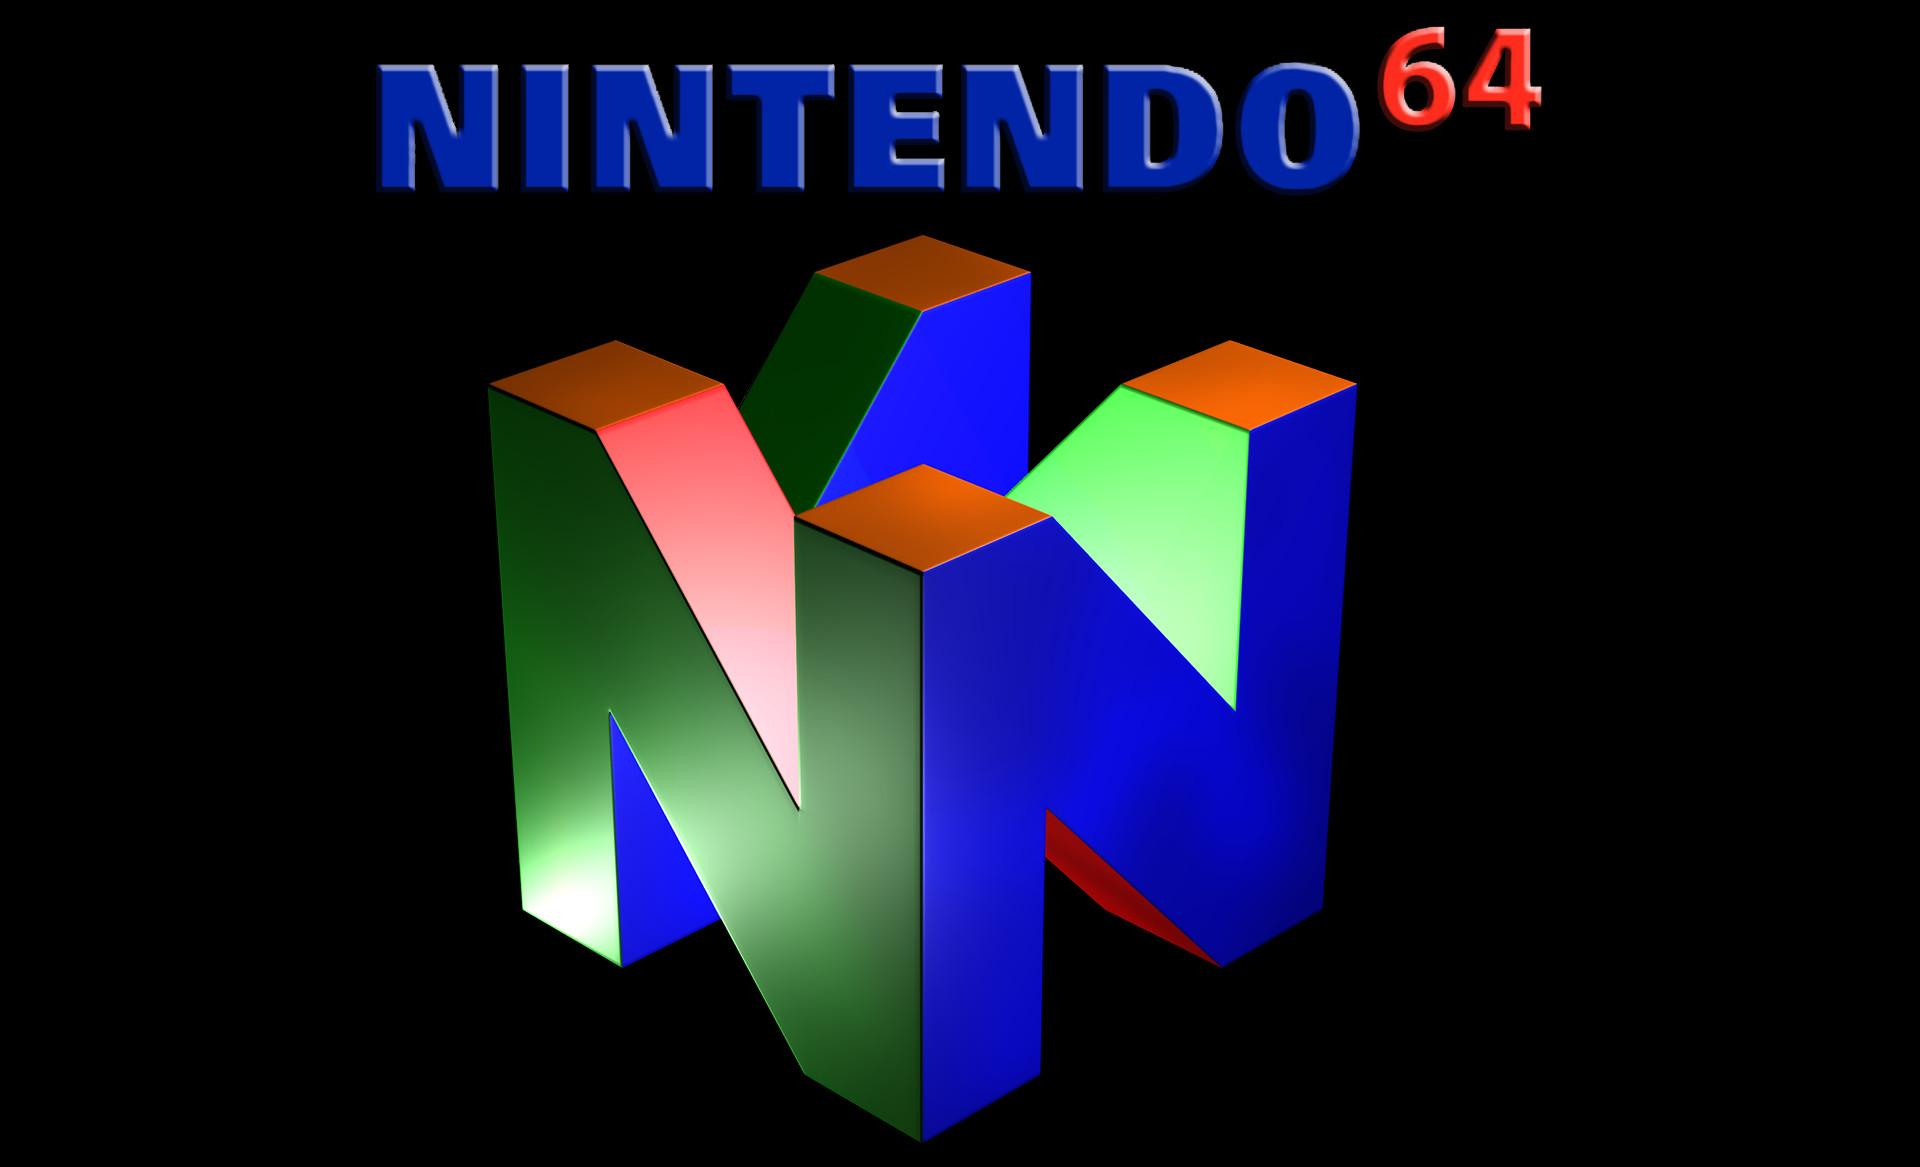 n64 wallpaper 70 images